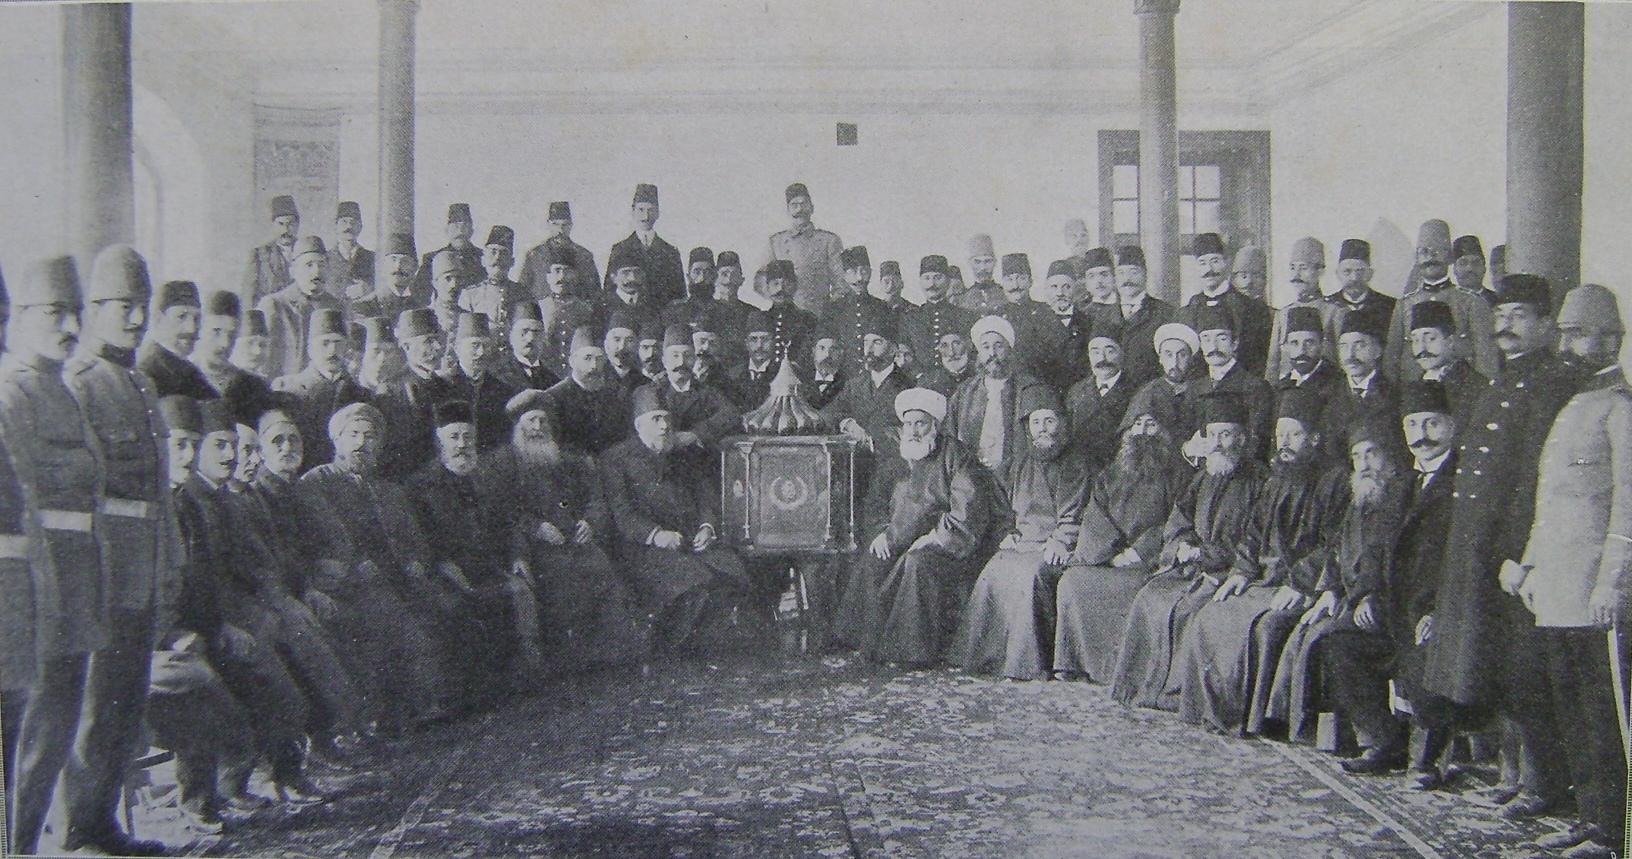 http://turksandarmenians.marmara.edu.tr/wp-content/uploads/2015/03/proje-hakkinda-gorsel.jpg